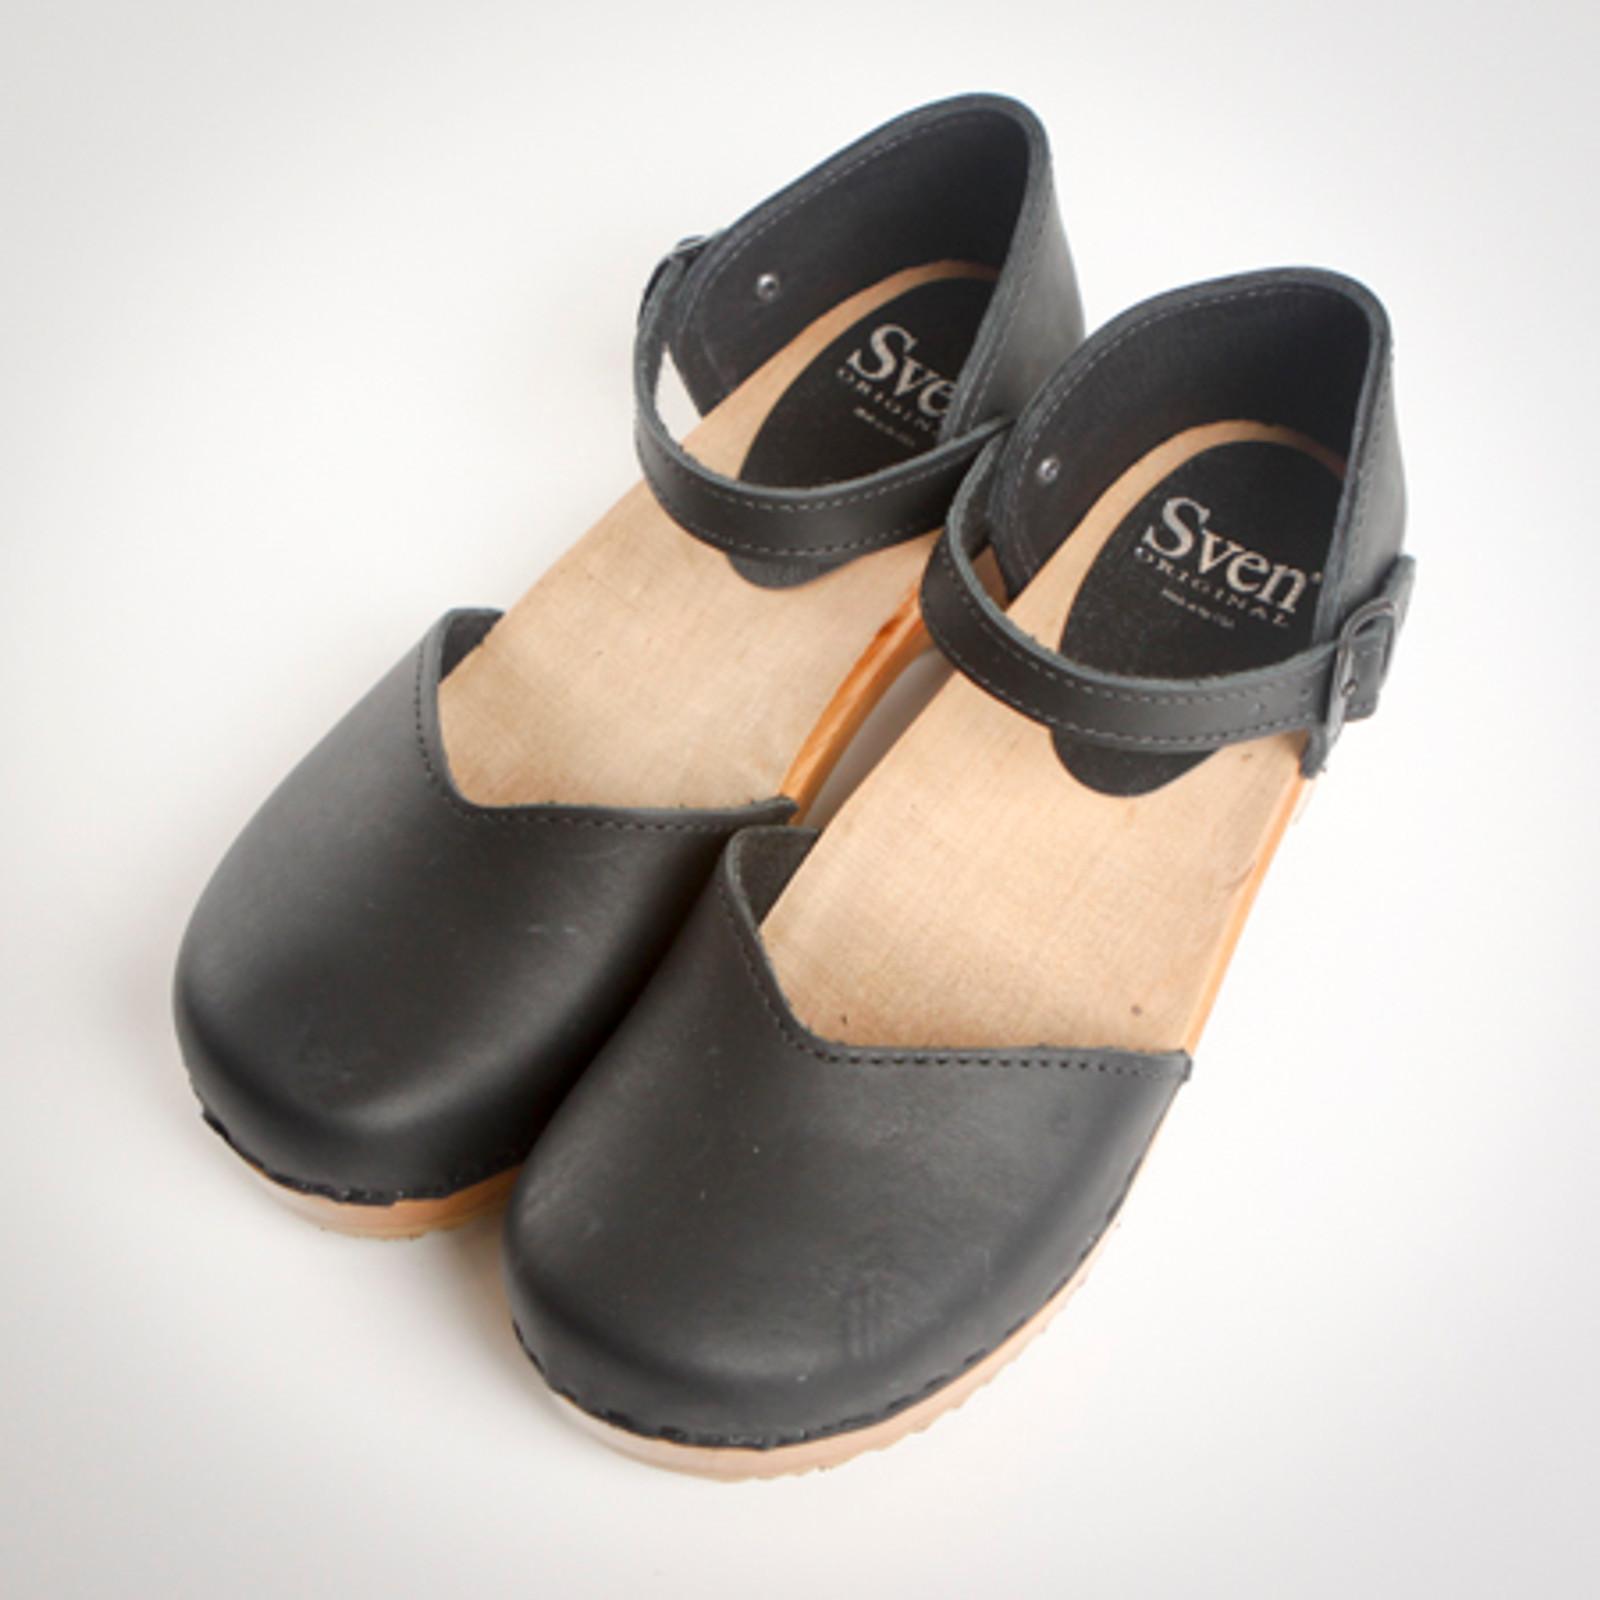 Closed Heel Clogs - Mary Jane - Swedish